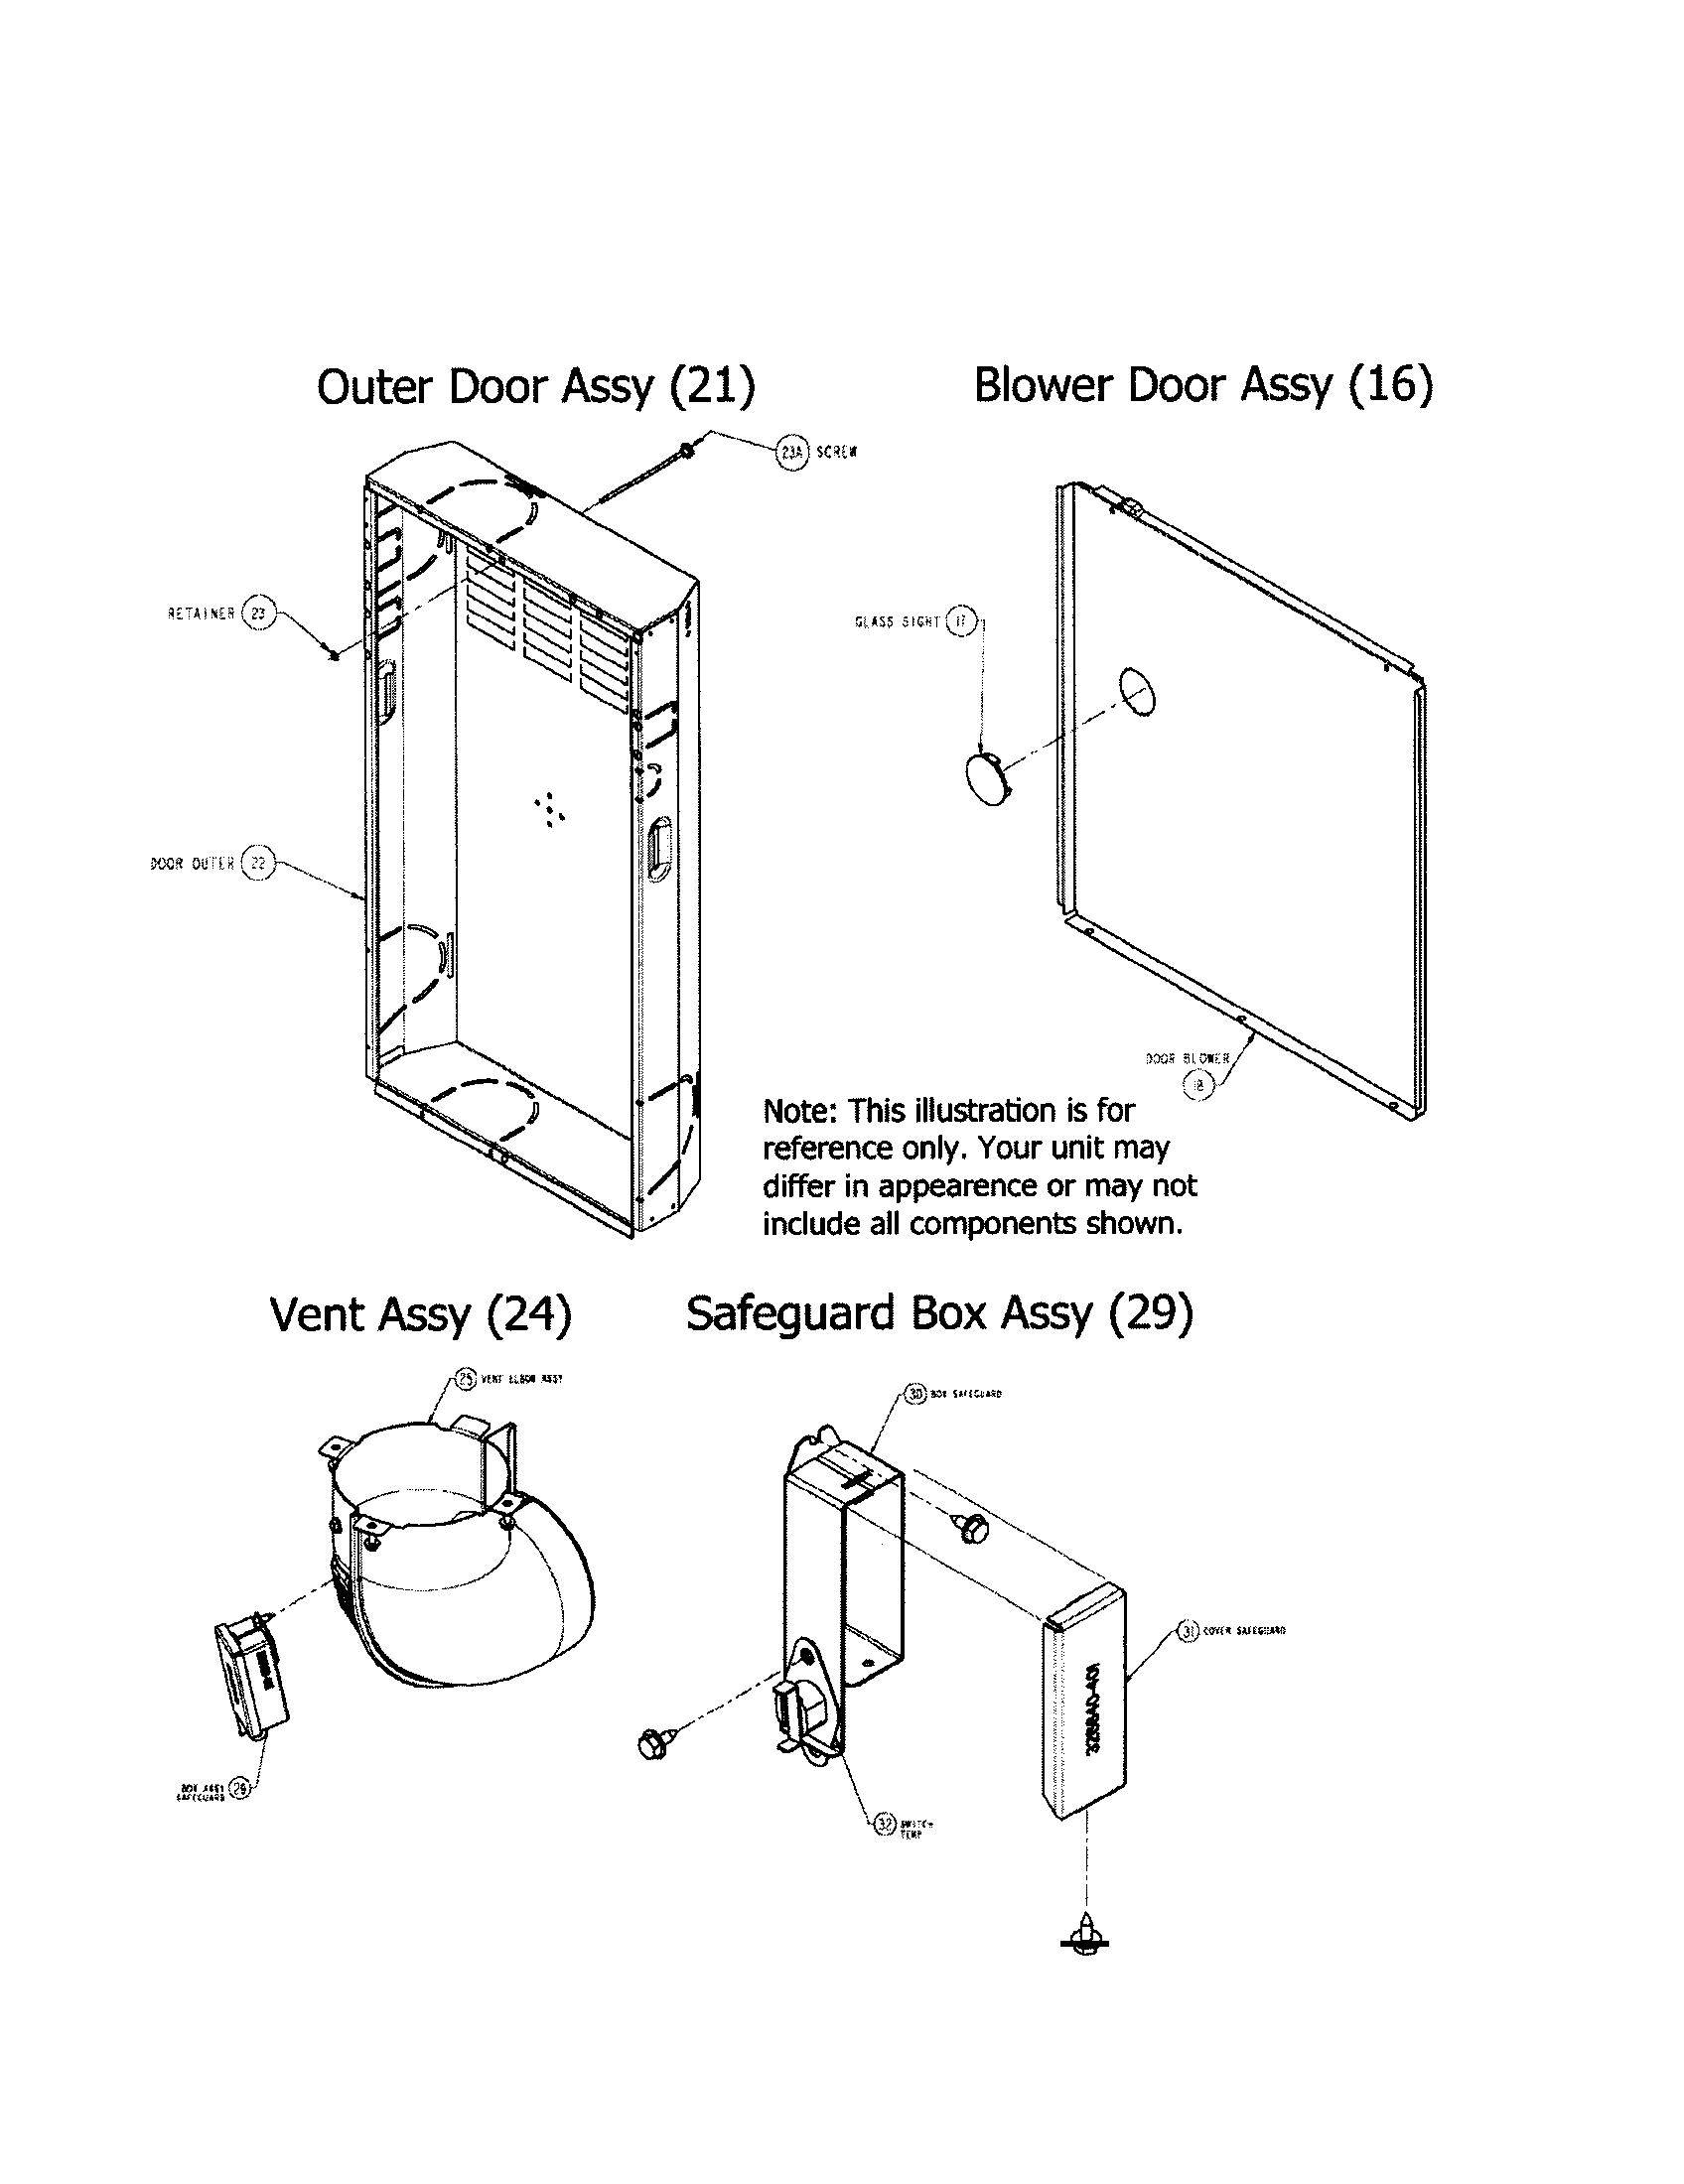 hight resolution of haier heat pump wiring diagram haier image wiring haier washer diagram all about repair and wiring